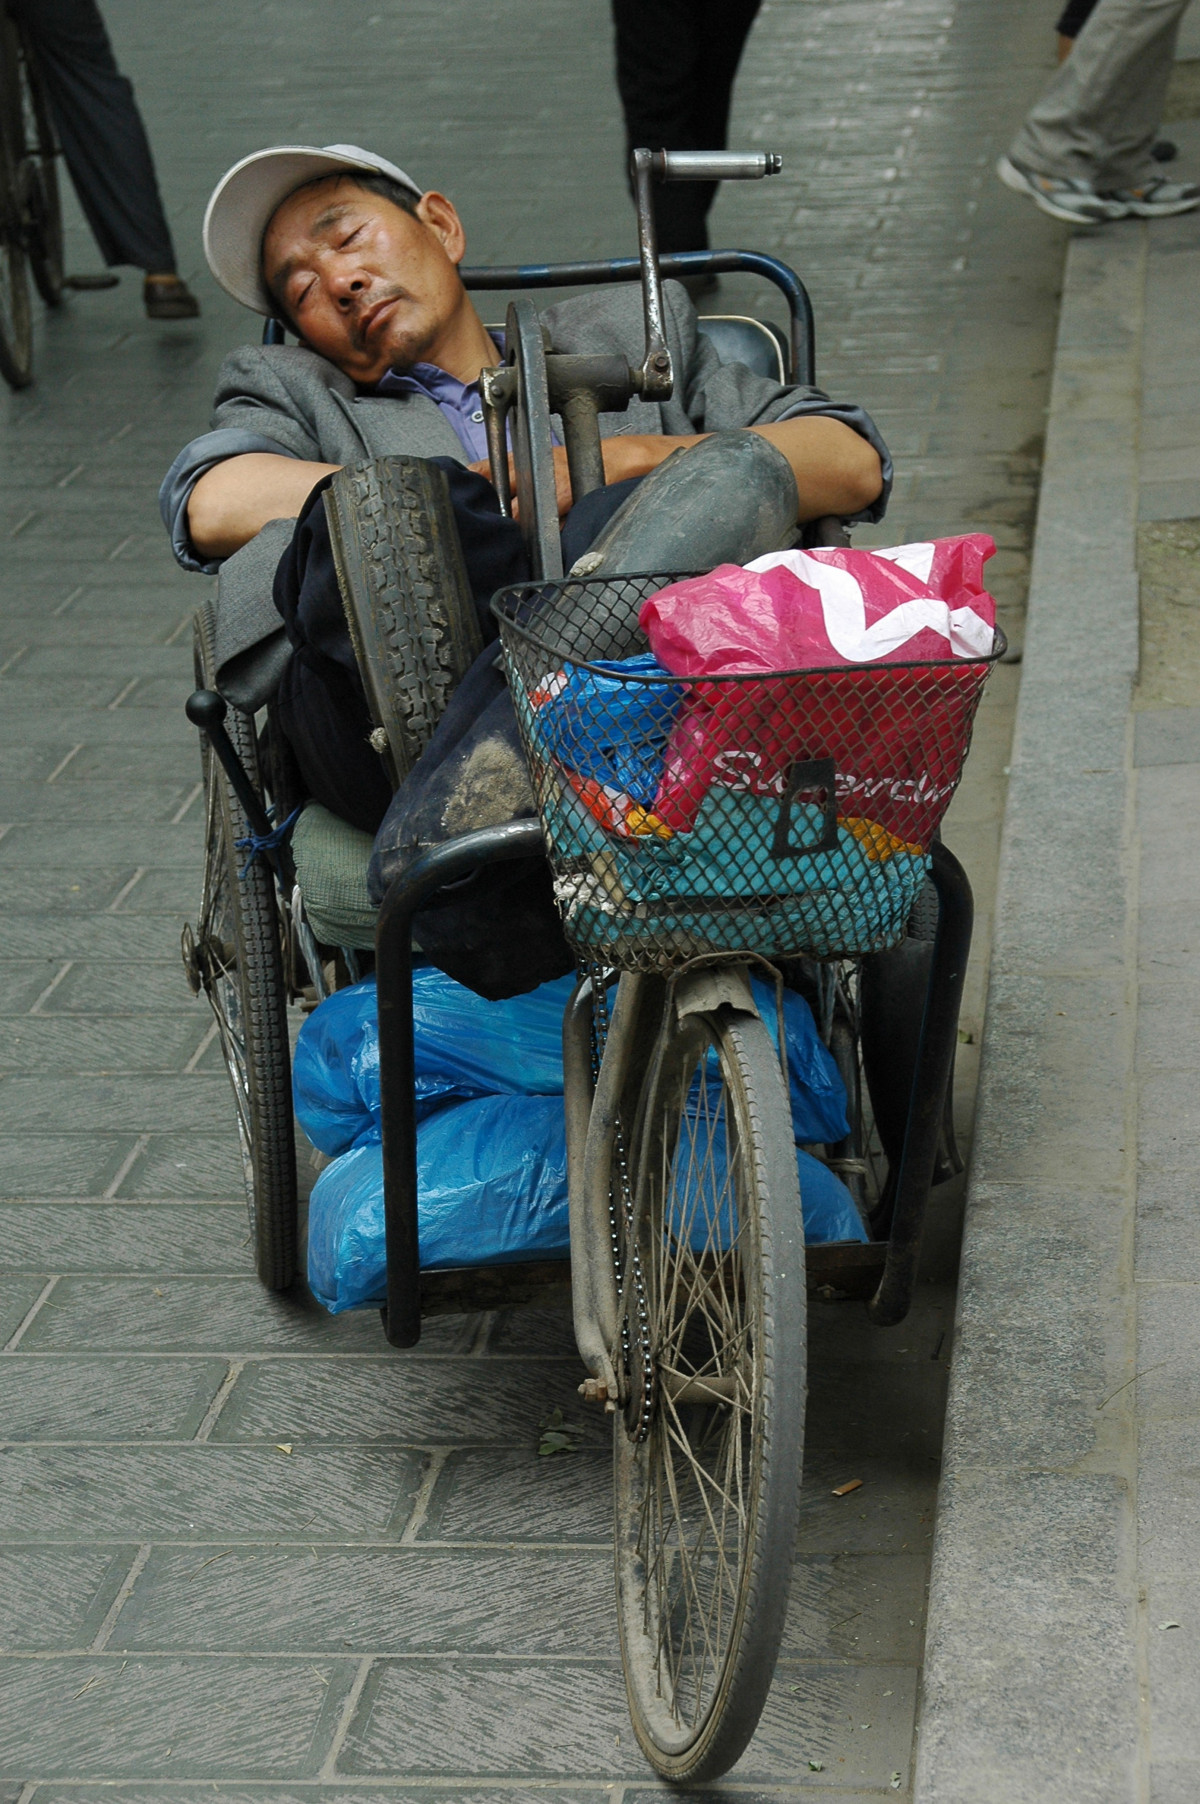 Free Images Street Bicycle Asphalt Vehicle Hat Park